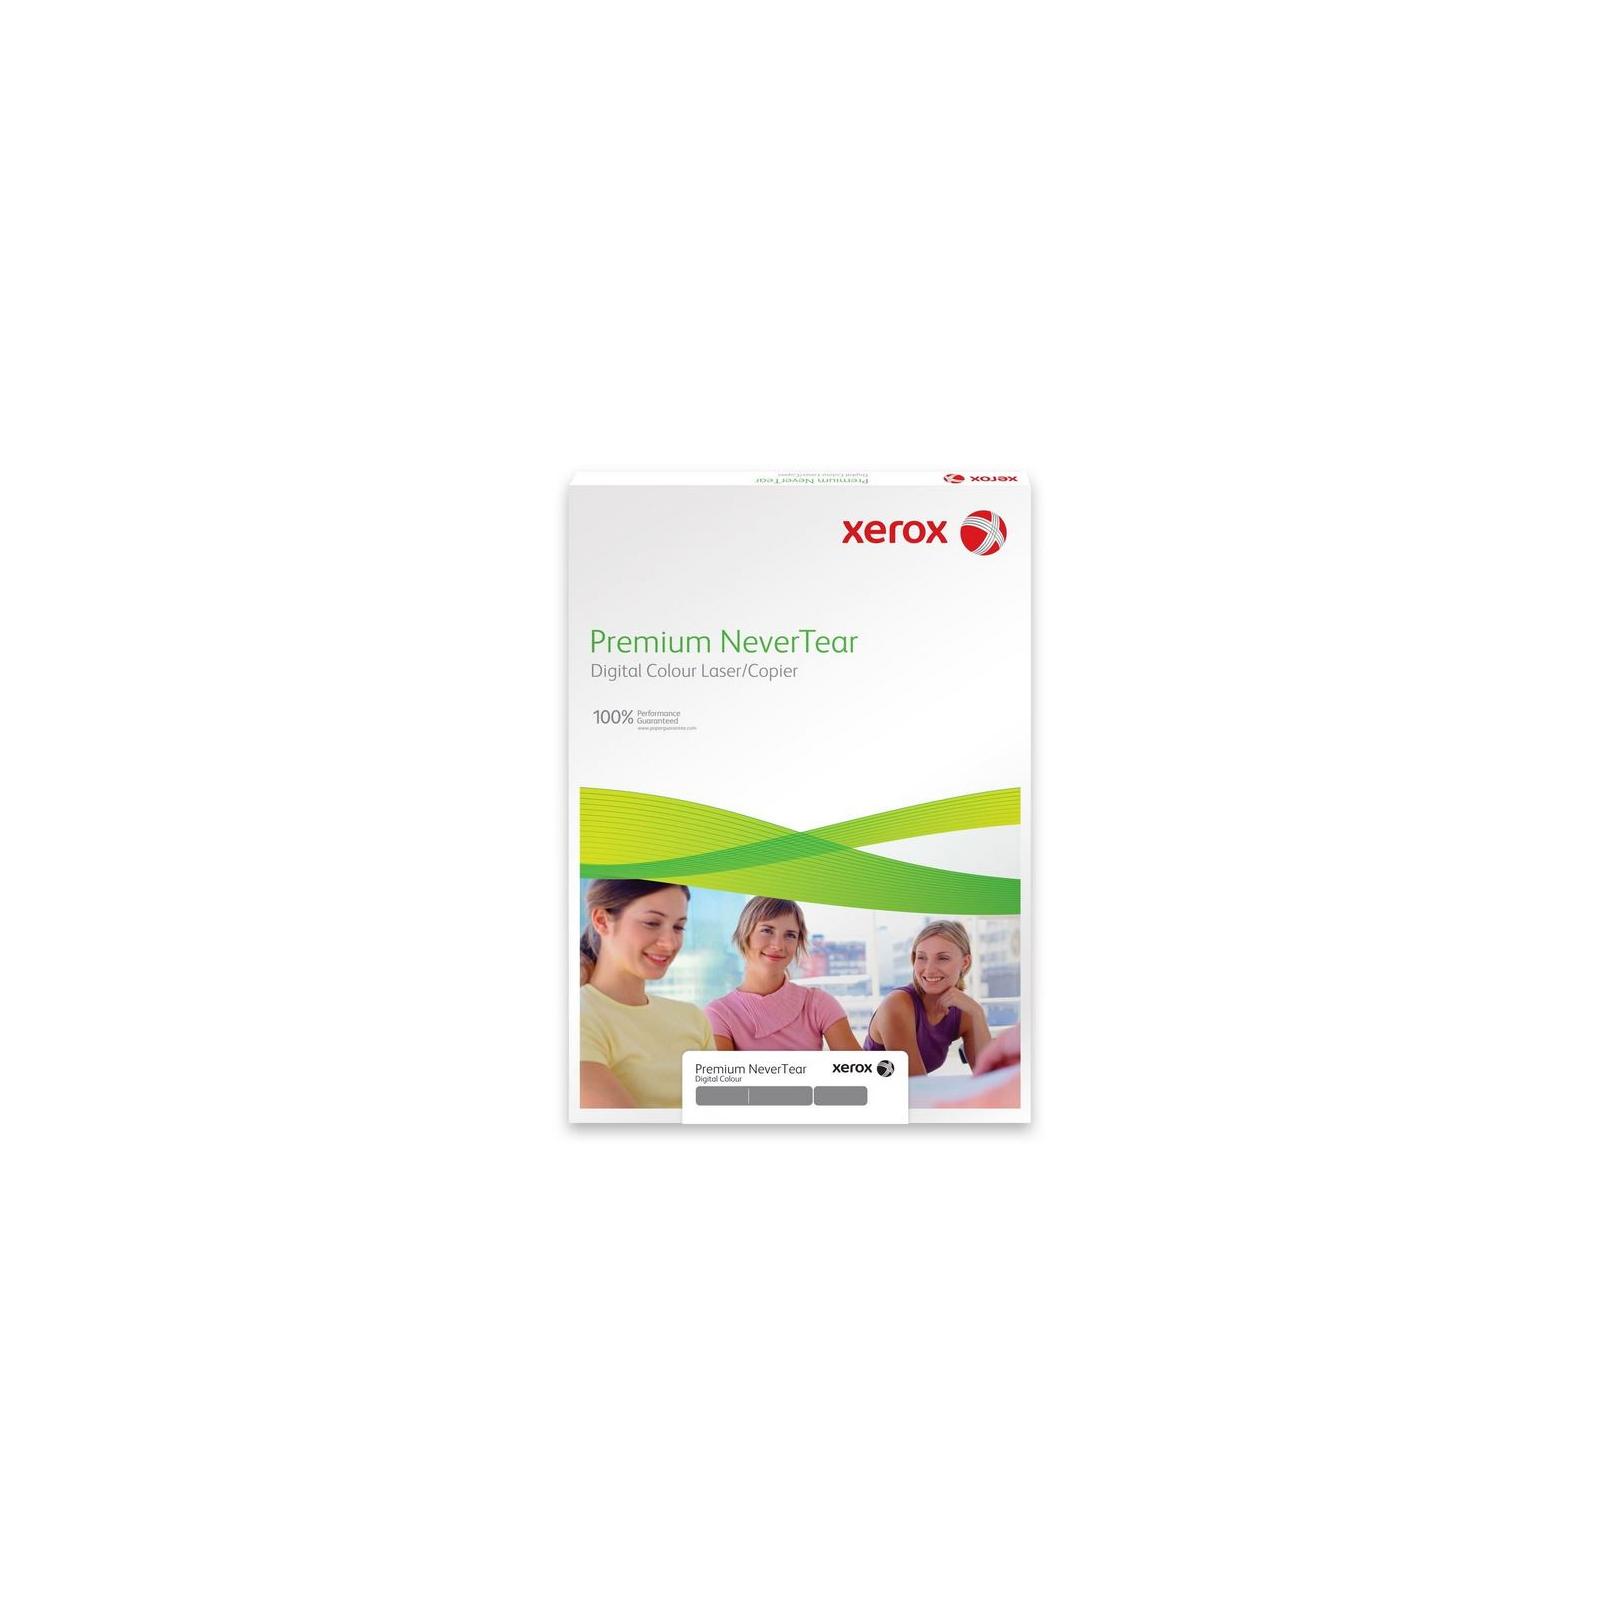 Бумага XEROX A3 Premium Never Tear 350г/м 100л (003R98065)